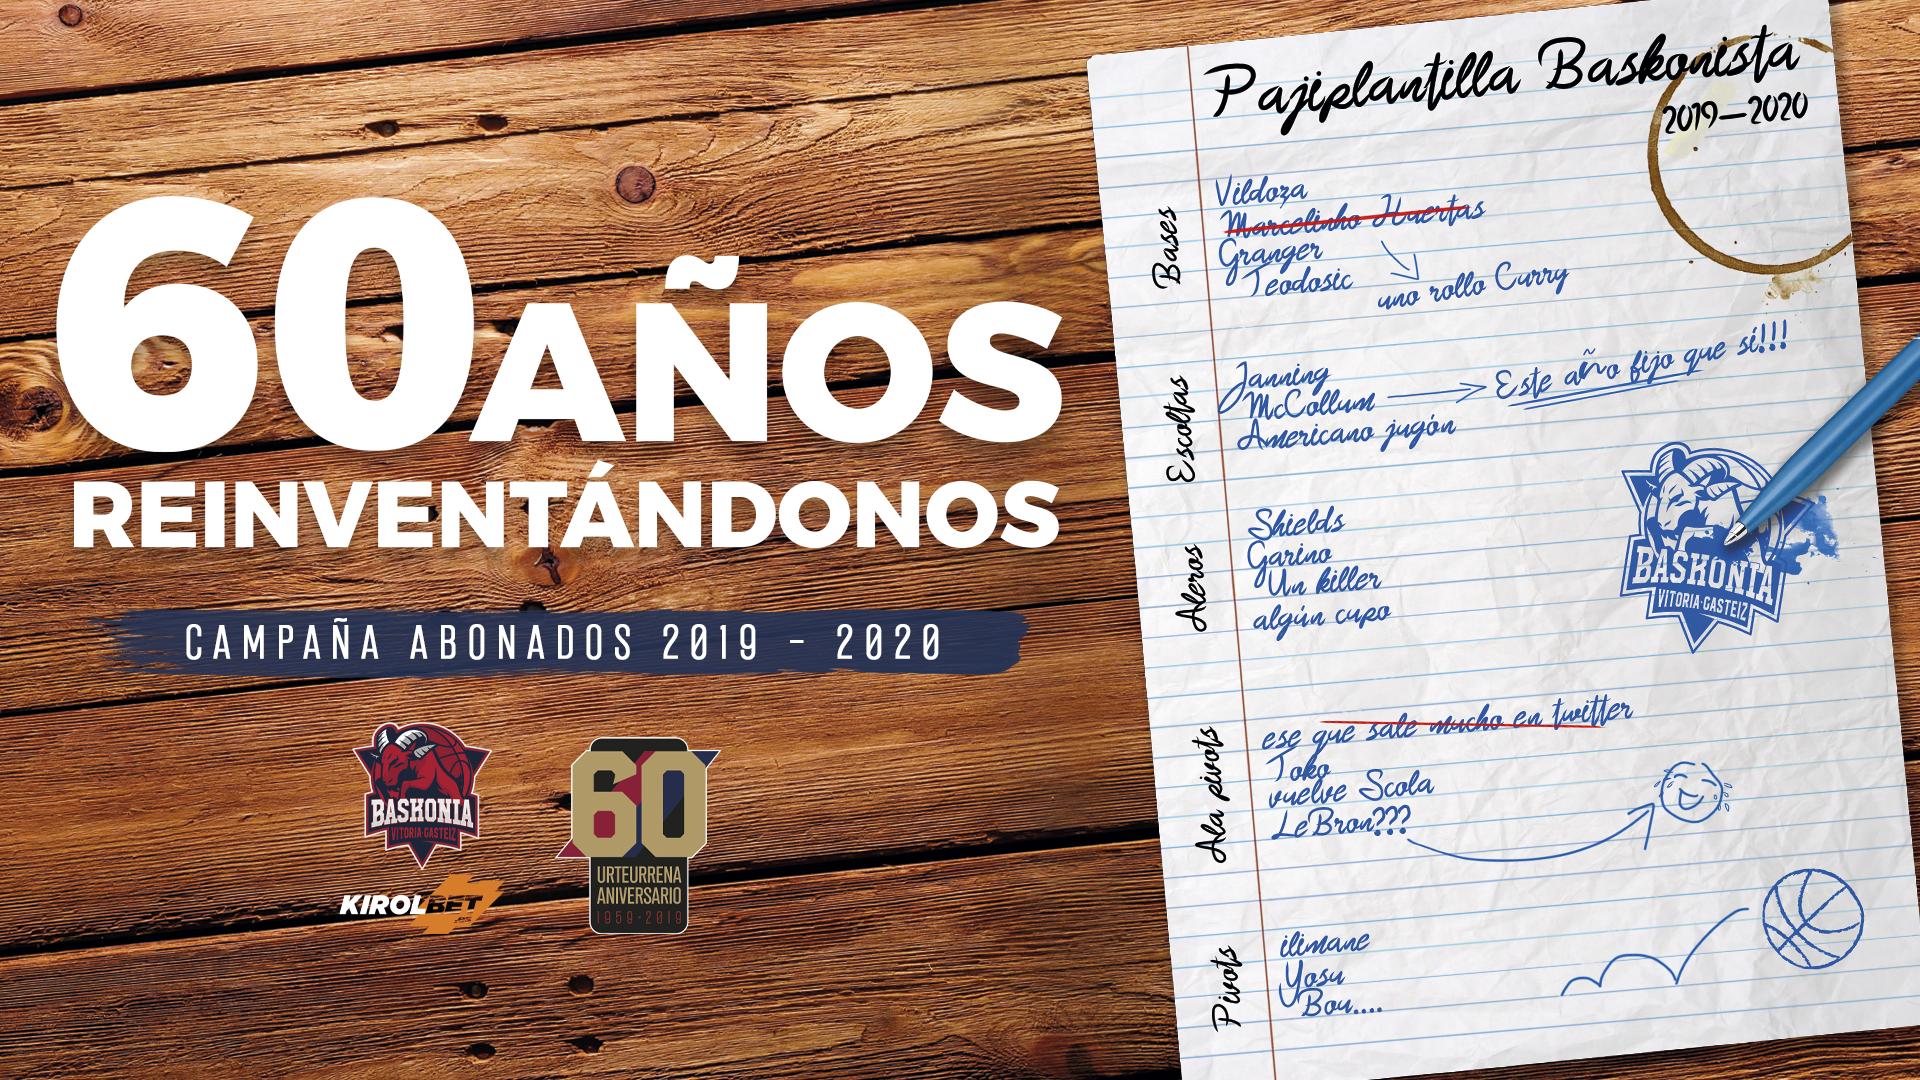 Calendario Laboral Alava 2020.Saski Baskonia Aspira A Mantener El Record Historico De Abonados